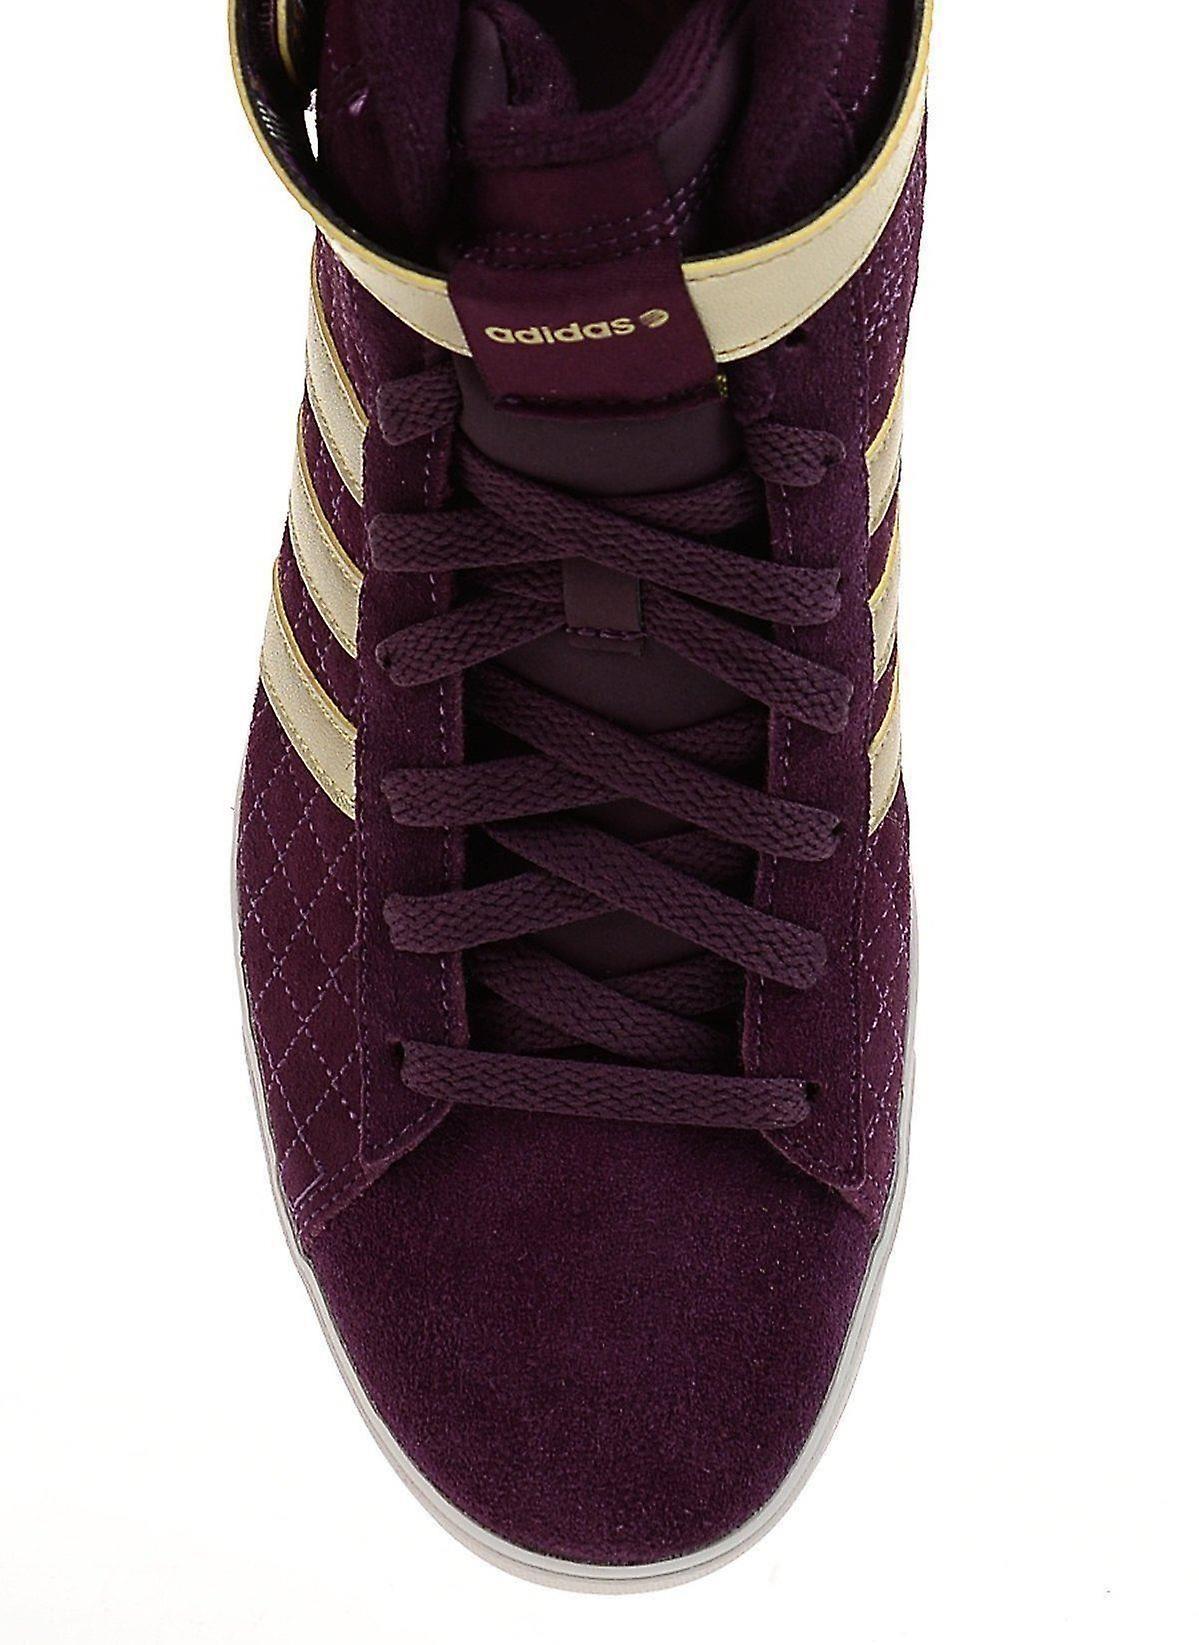 adidas Women's Daily Twist Mid W Trainers Merlot F98631 UK6/EU 39 1/3